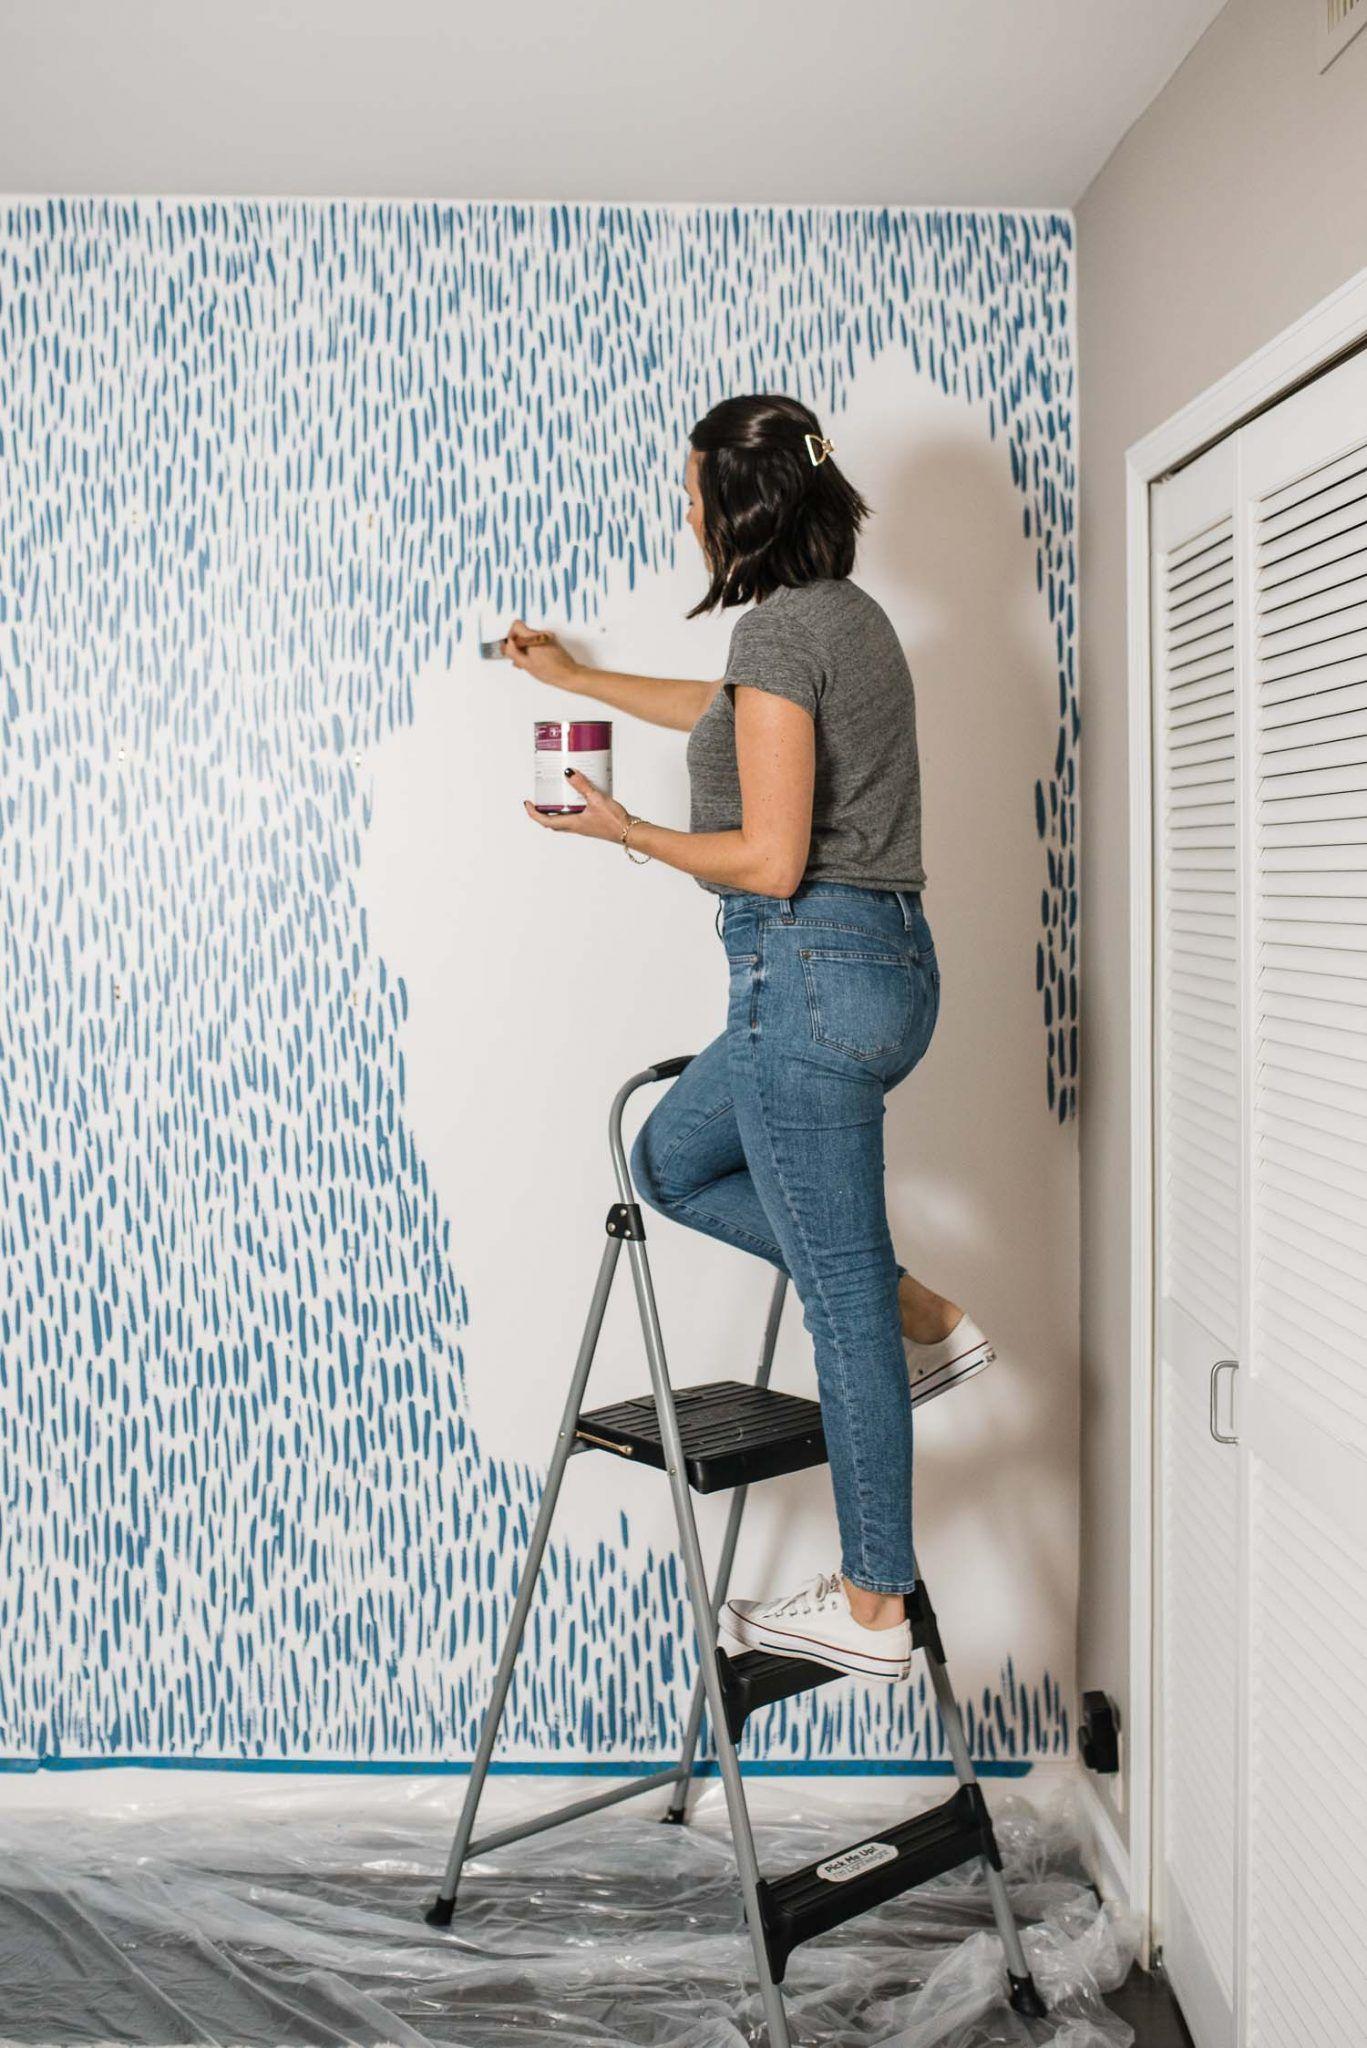 Diy Brushstroke Accent Wall Tutorial Diy Accent Wall Bedroom Diy Diy Bedroom Decor